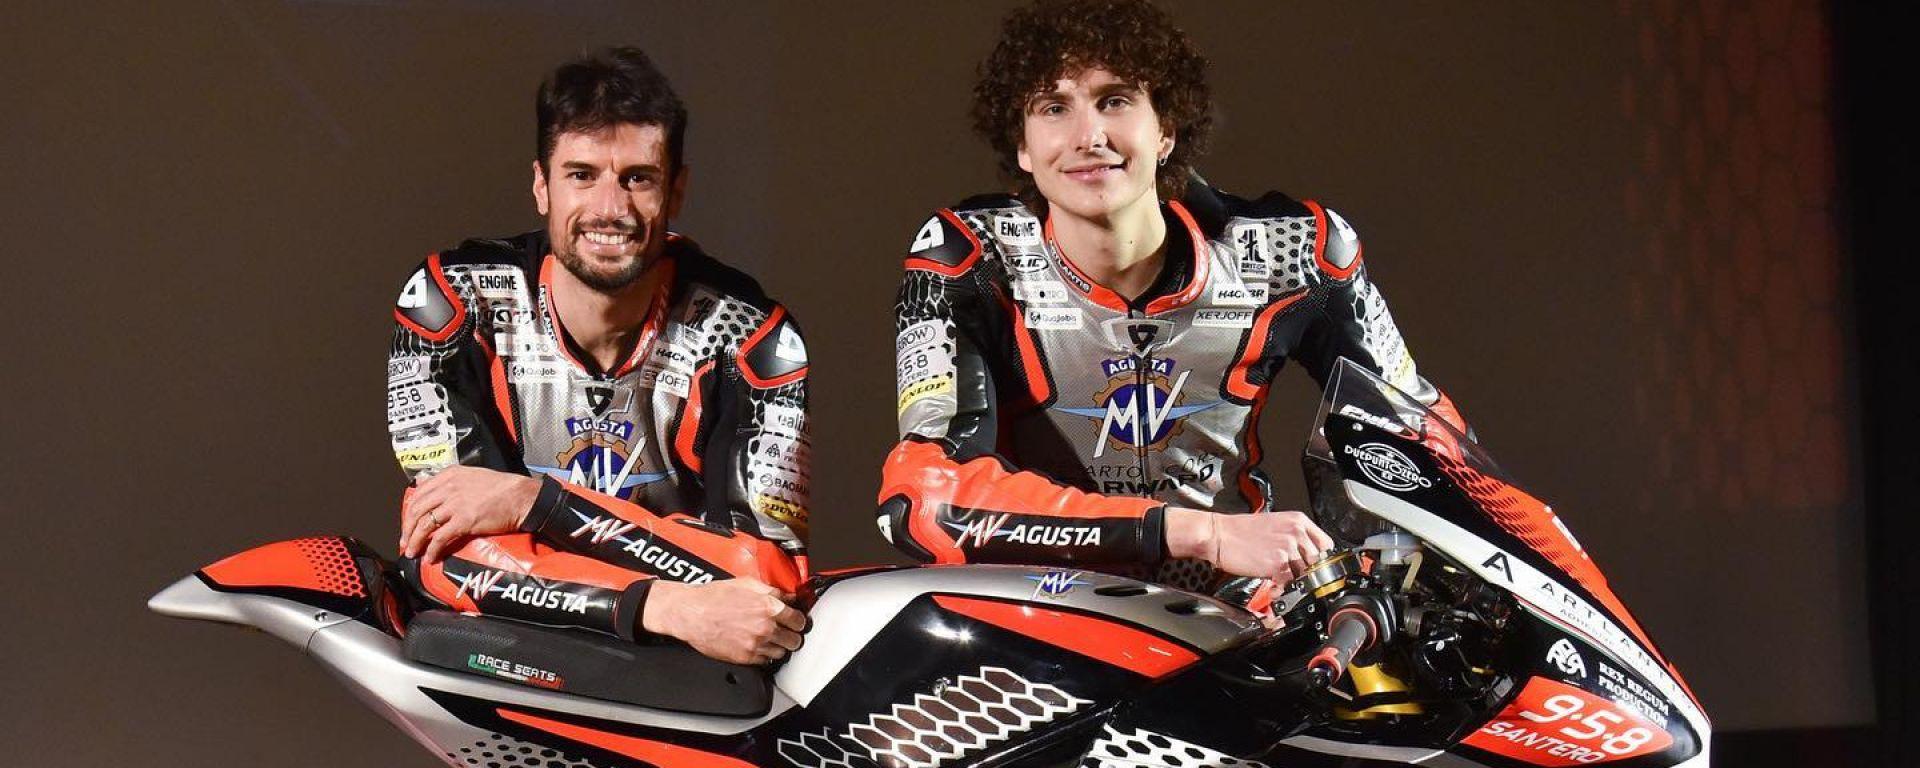 Simone Corsi e Lorenzo Baldassarri